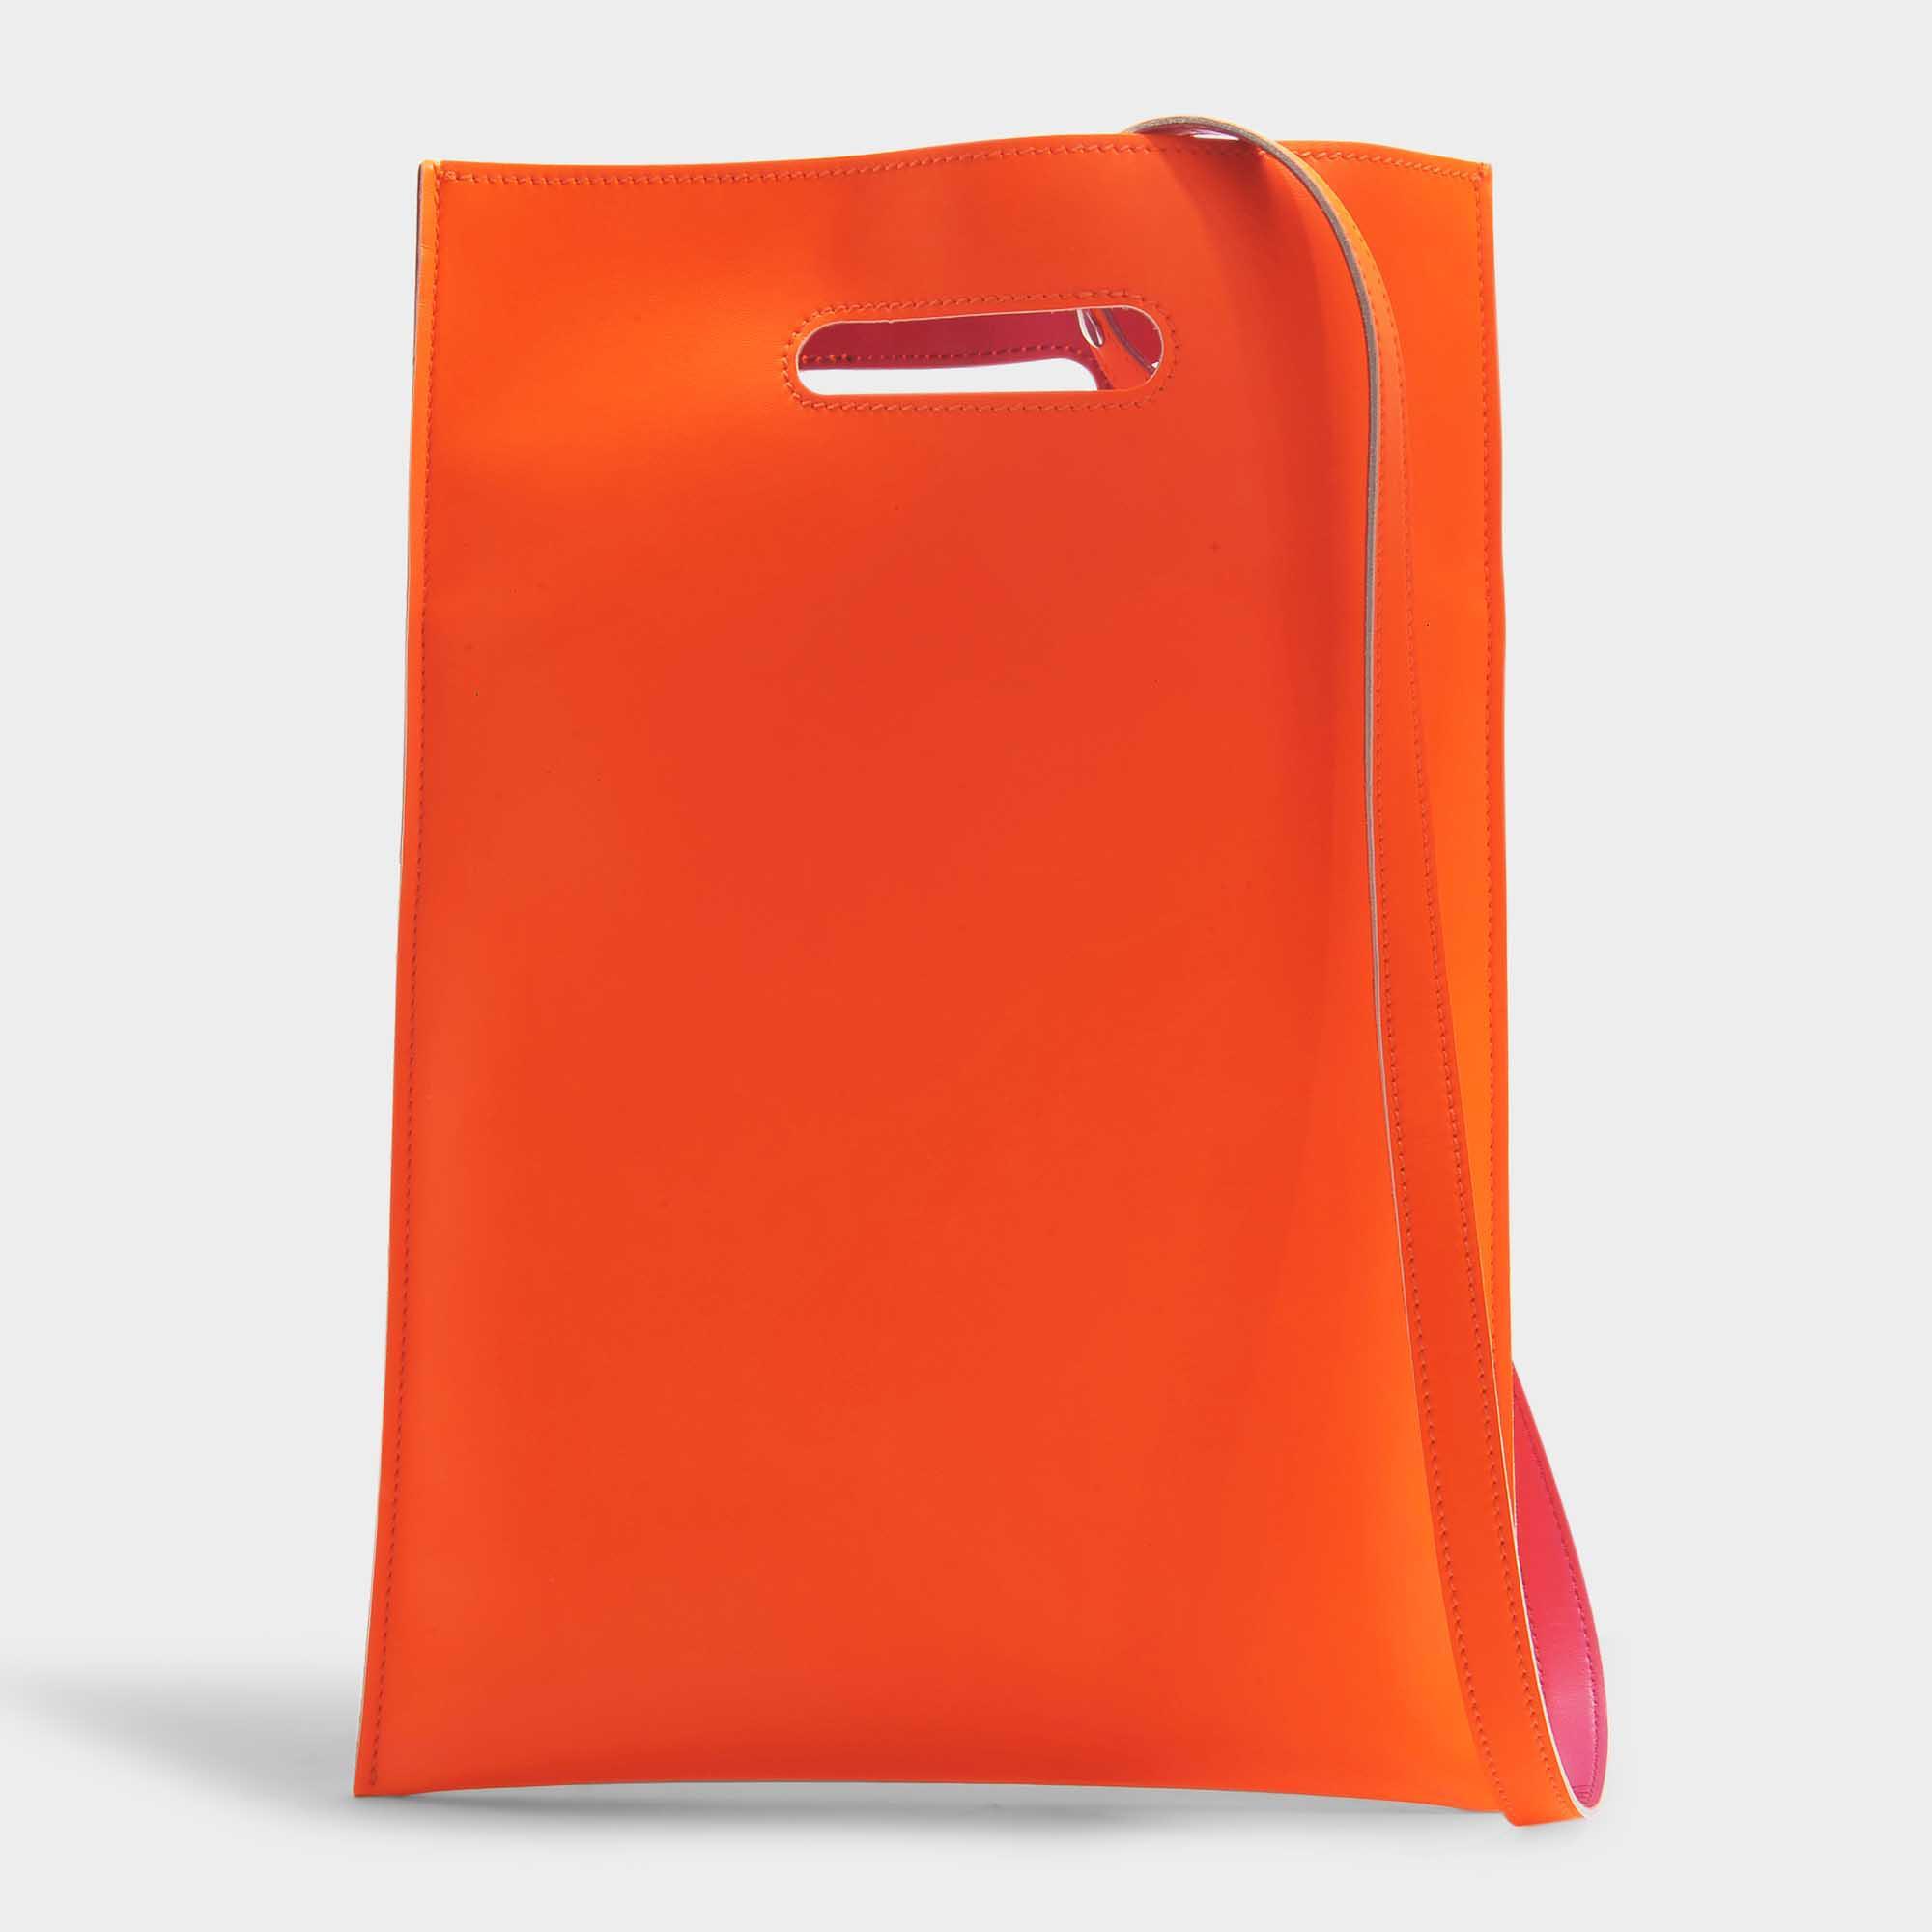 MM6 Maison Margiela Sac Plastic Porté Main en Cuir Synthétique Orange Fluo kCUQcyw6f